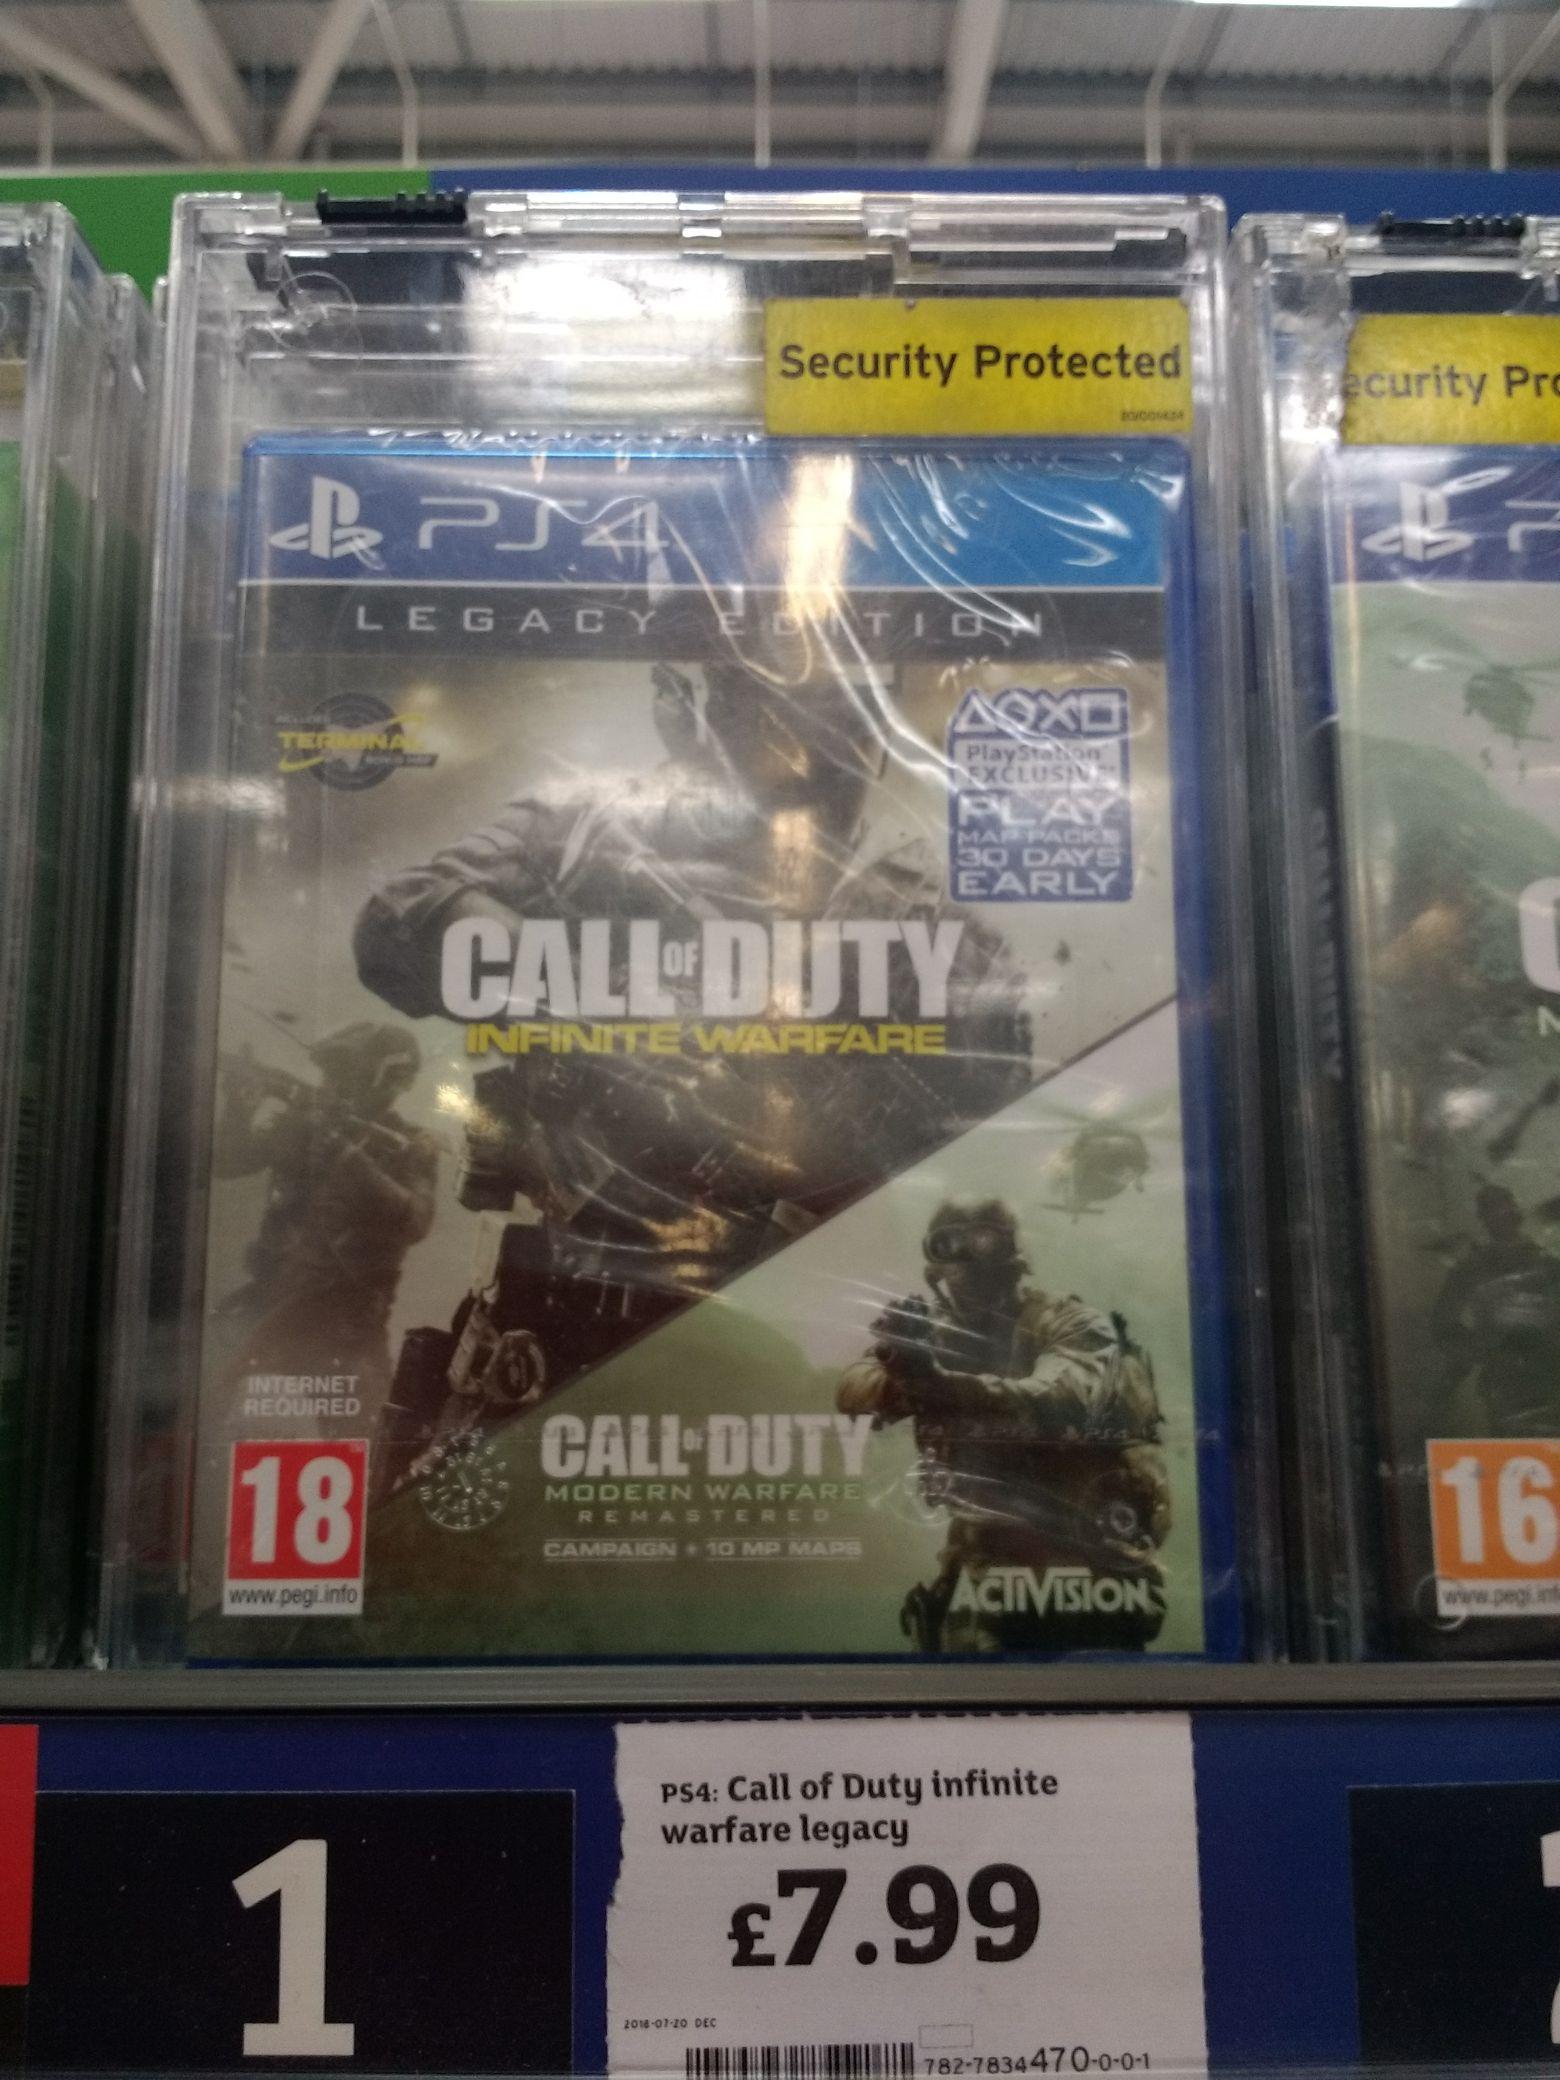 Call Of Duty: Infinite Warfare Legacy Edition PS4 £7.99 @ Sainsbury's